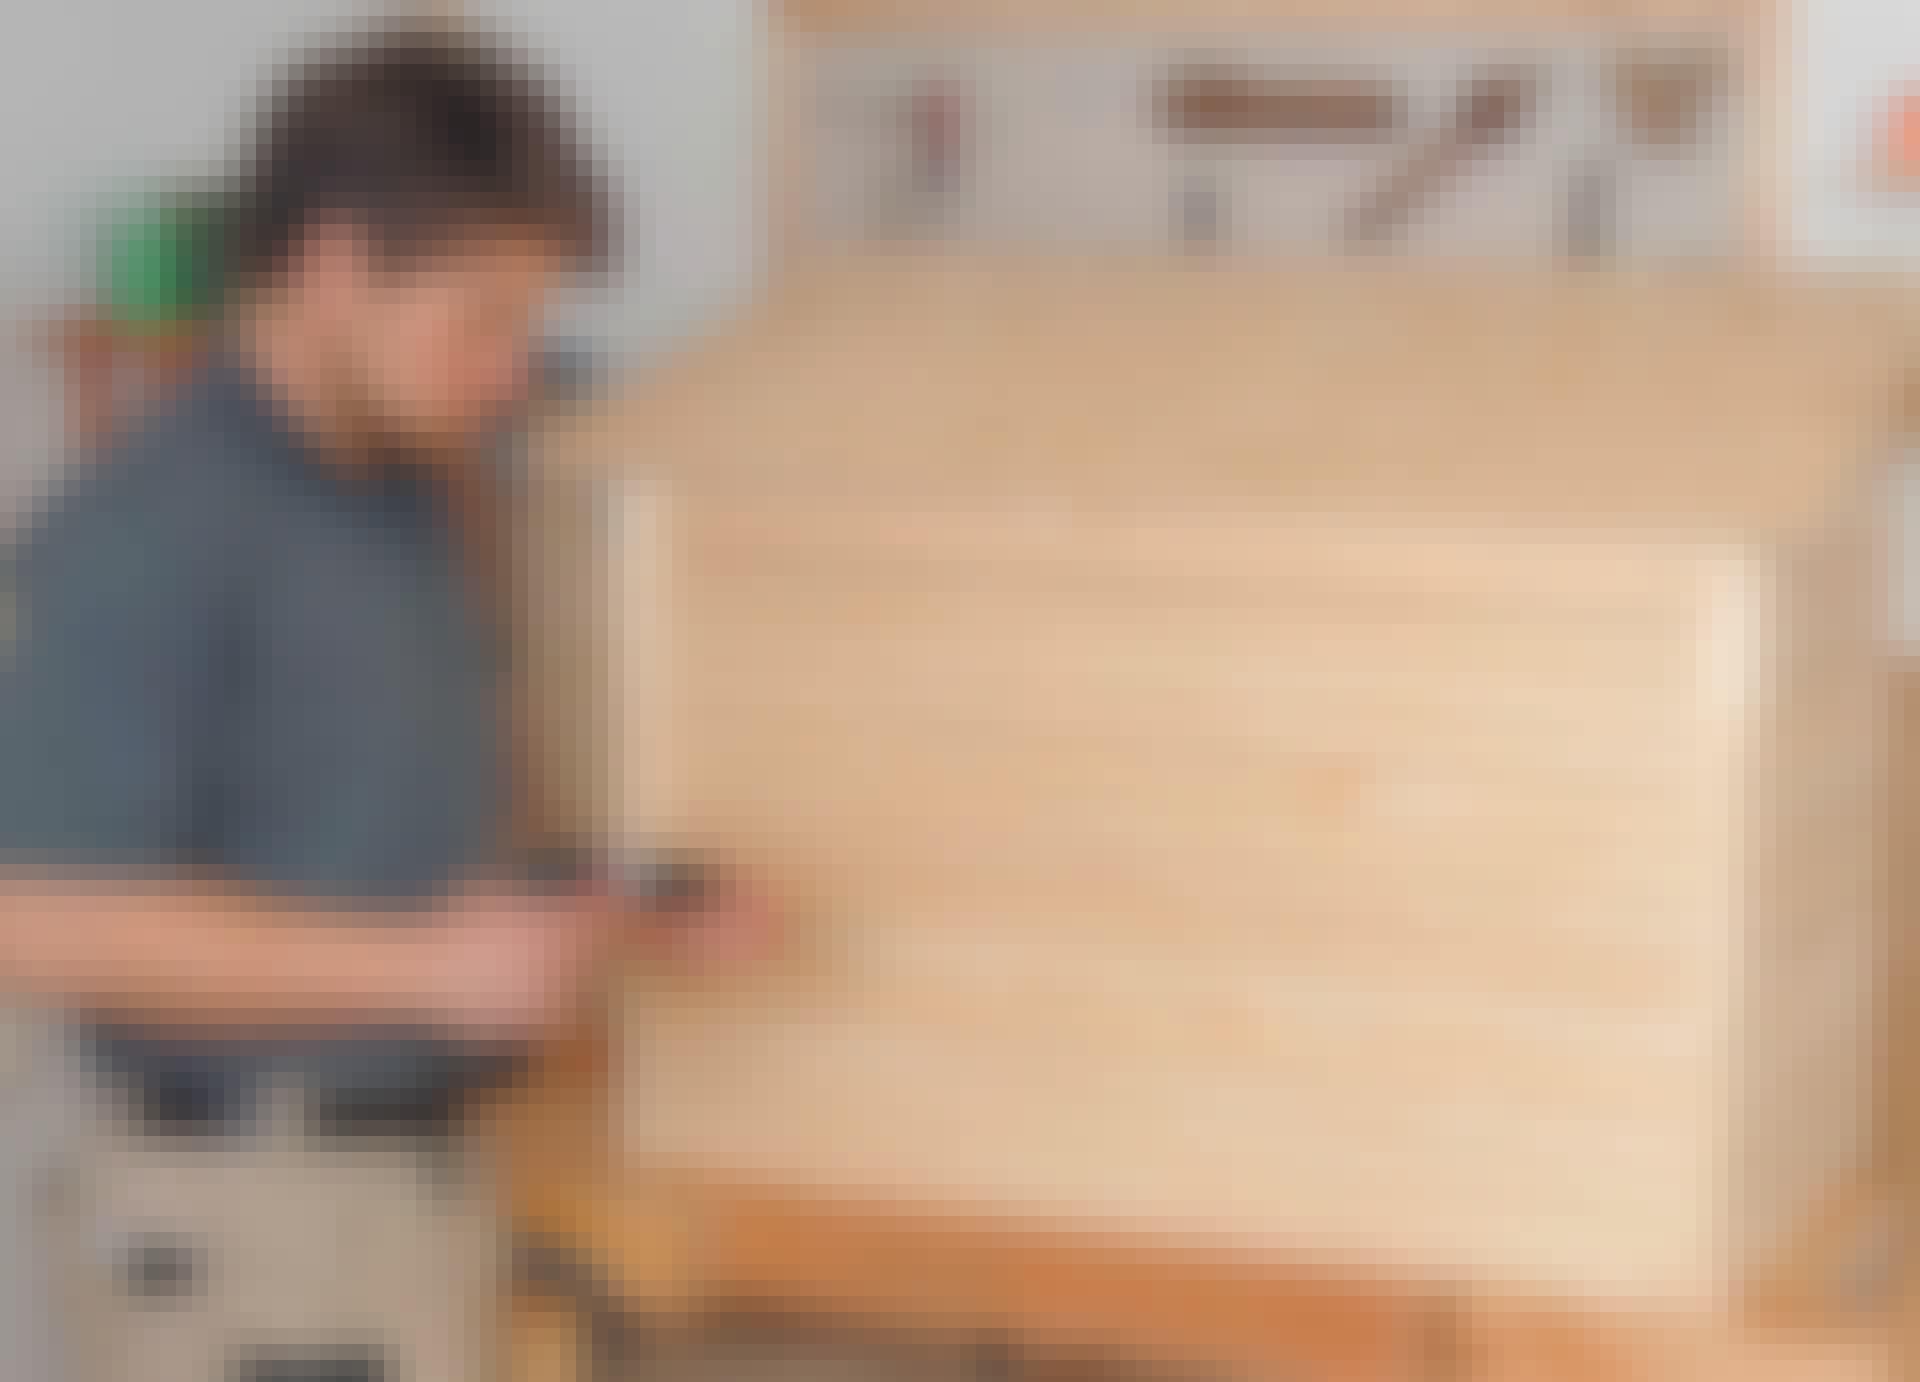 Varmepumpeskjuler: Slik bygger du et varmepumpeskjul